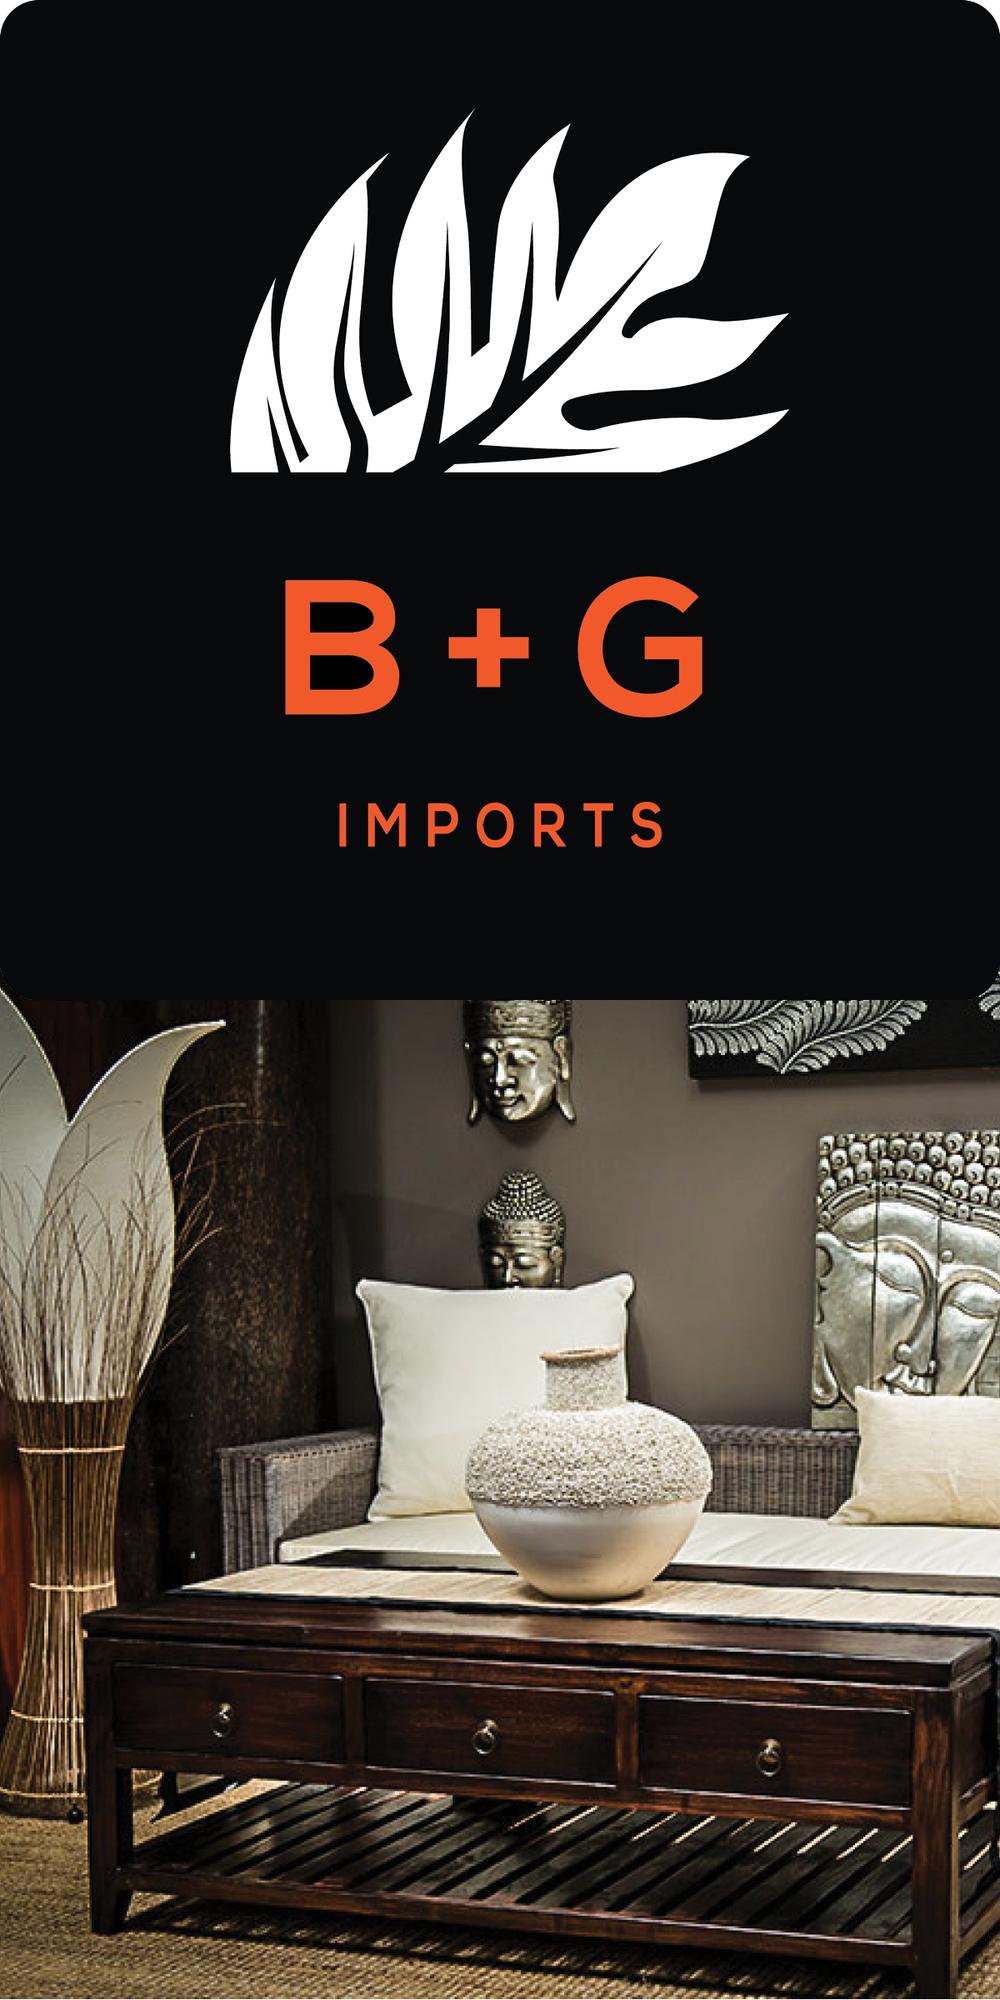 B+G_SQUARES+PHOTOS2.jpg